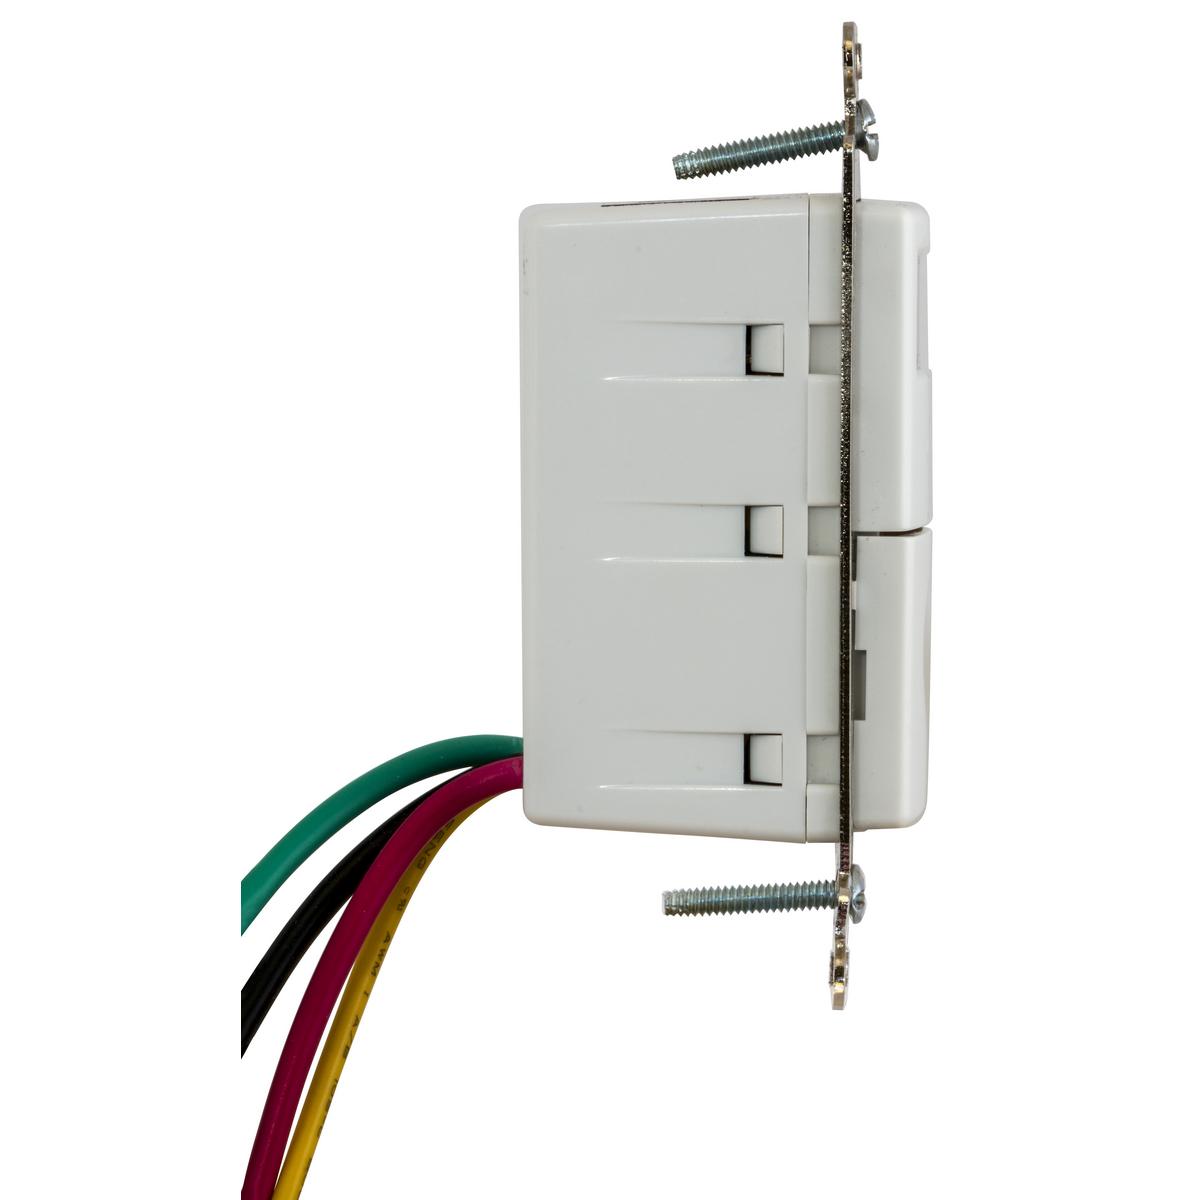 Wiring Device-Kellems DT2000W